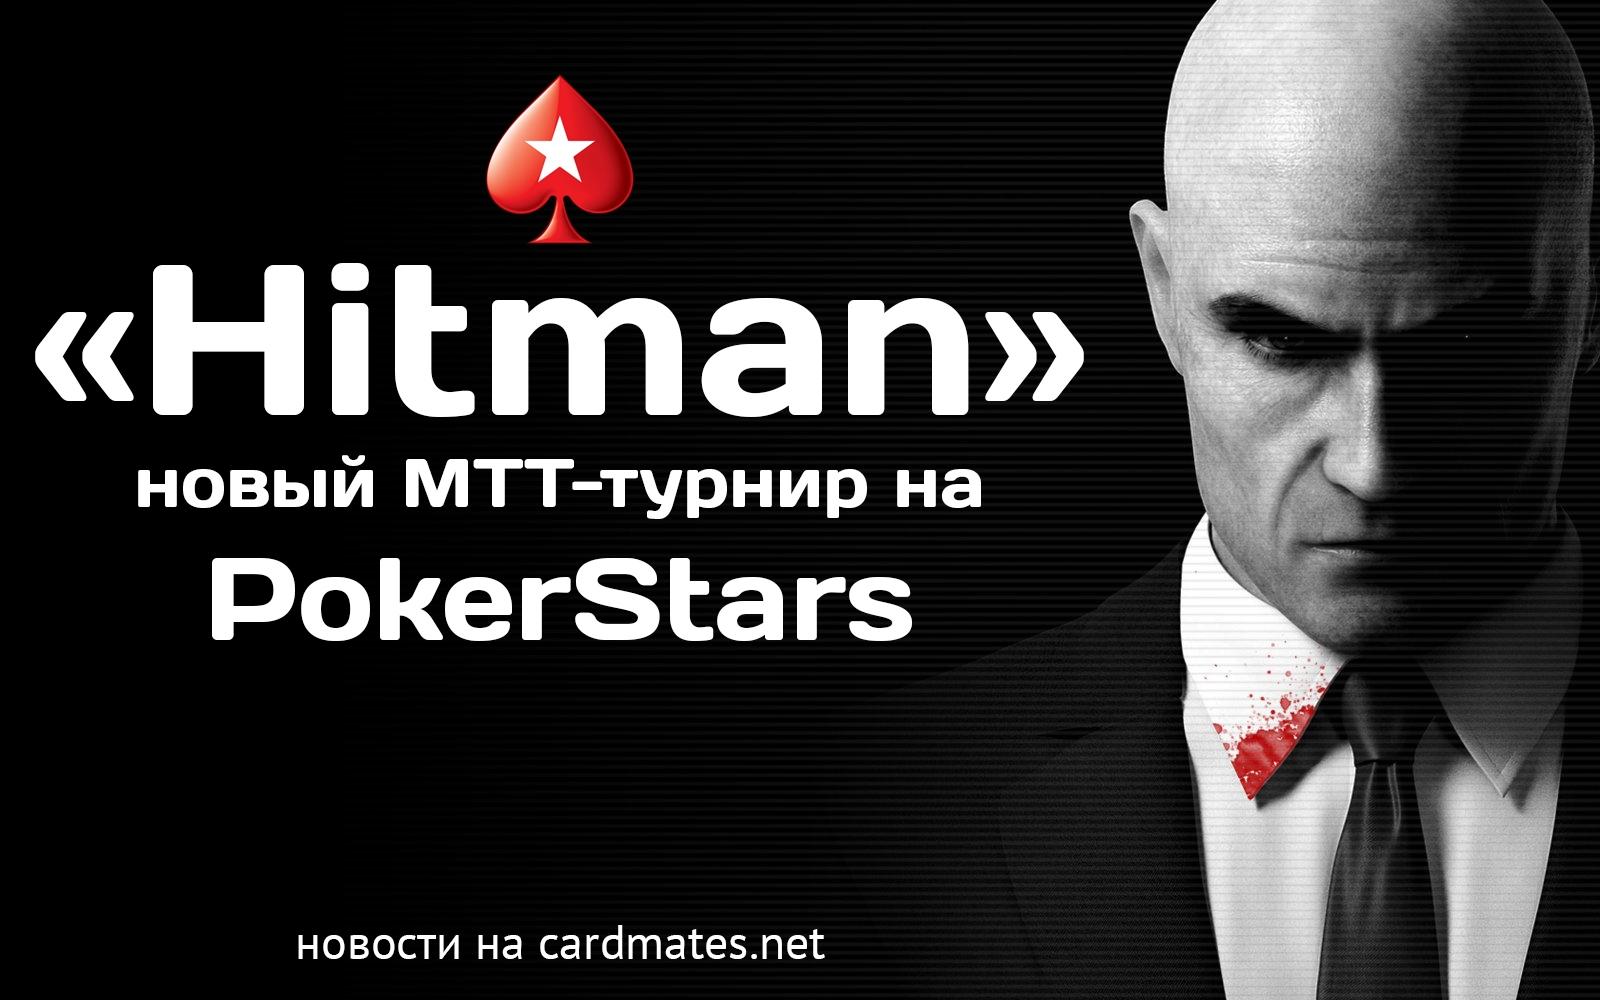 Hitman PokerStars